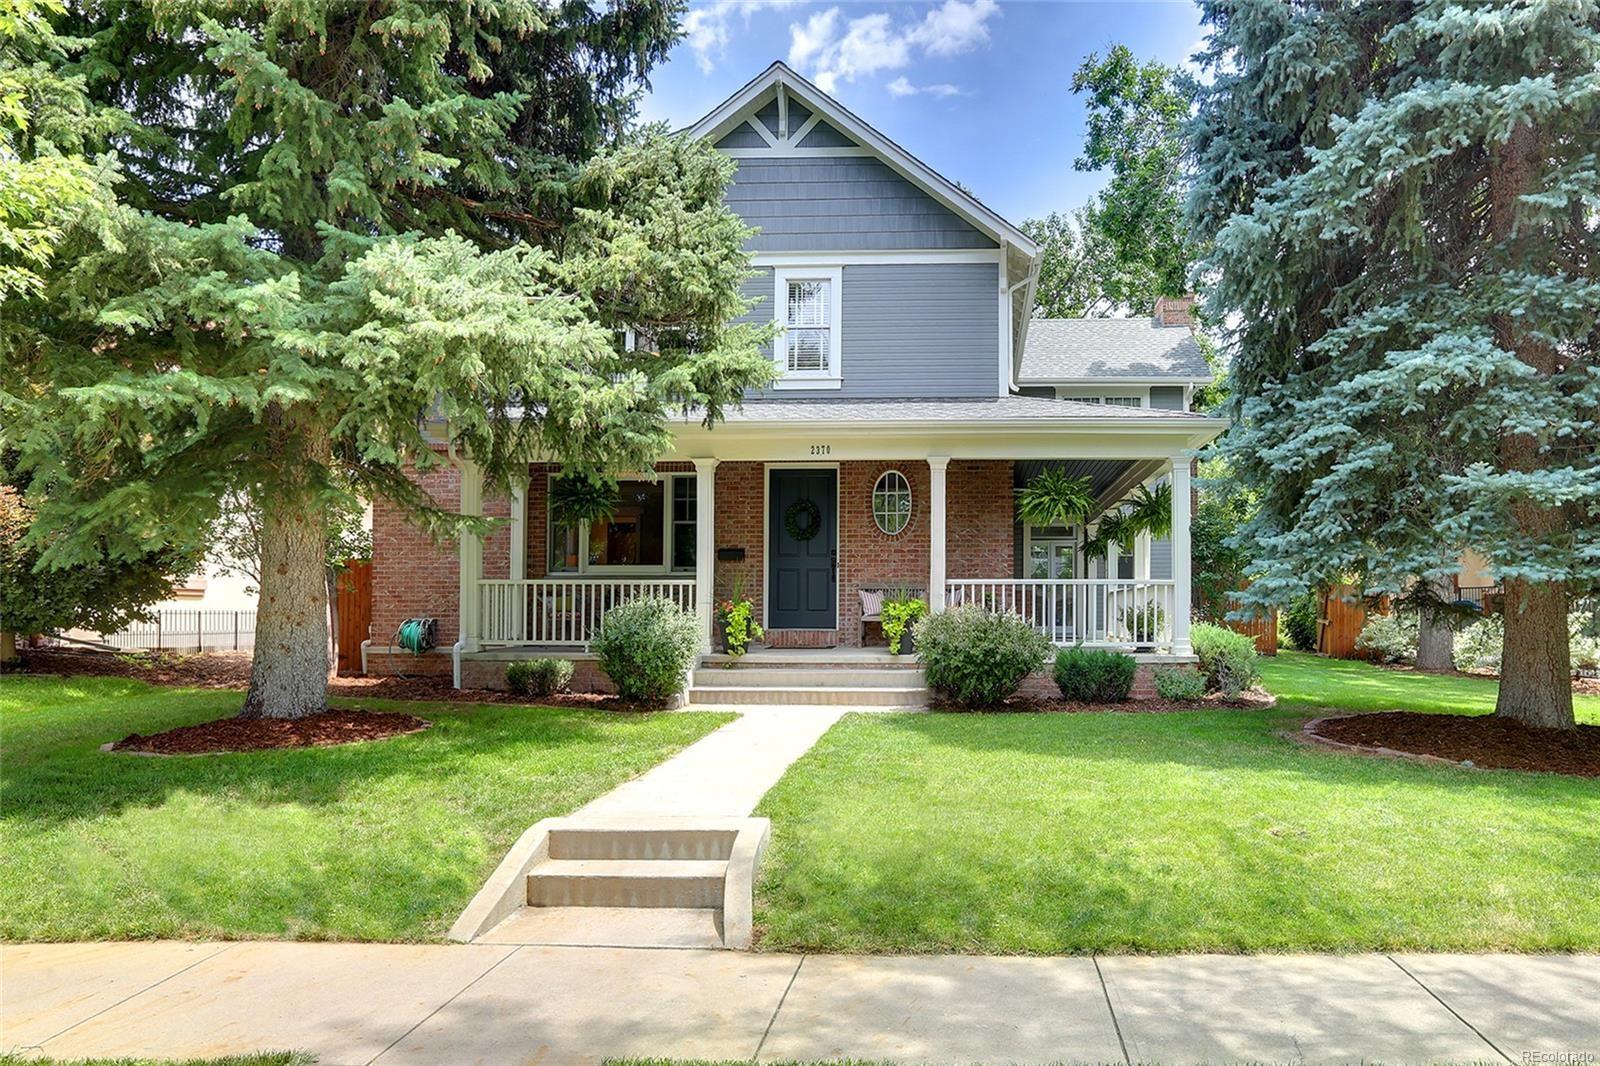 MLS# 1747887 - 1 - 2370  S Adams Street, Denver, CO 80210